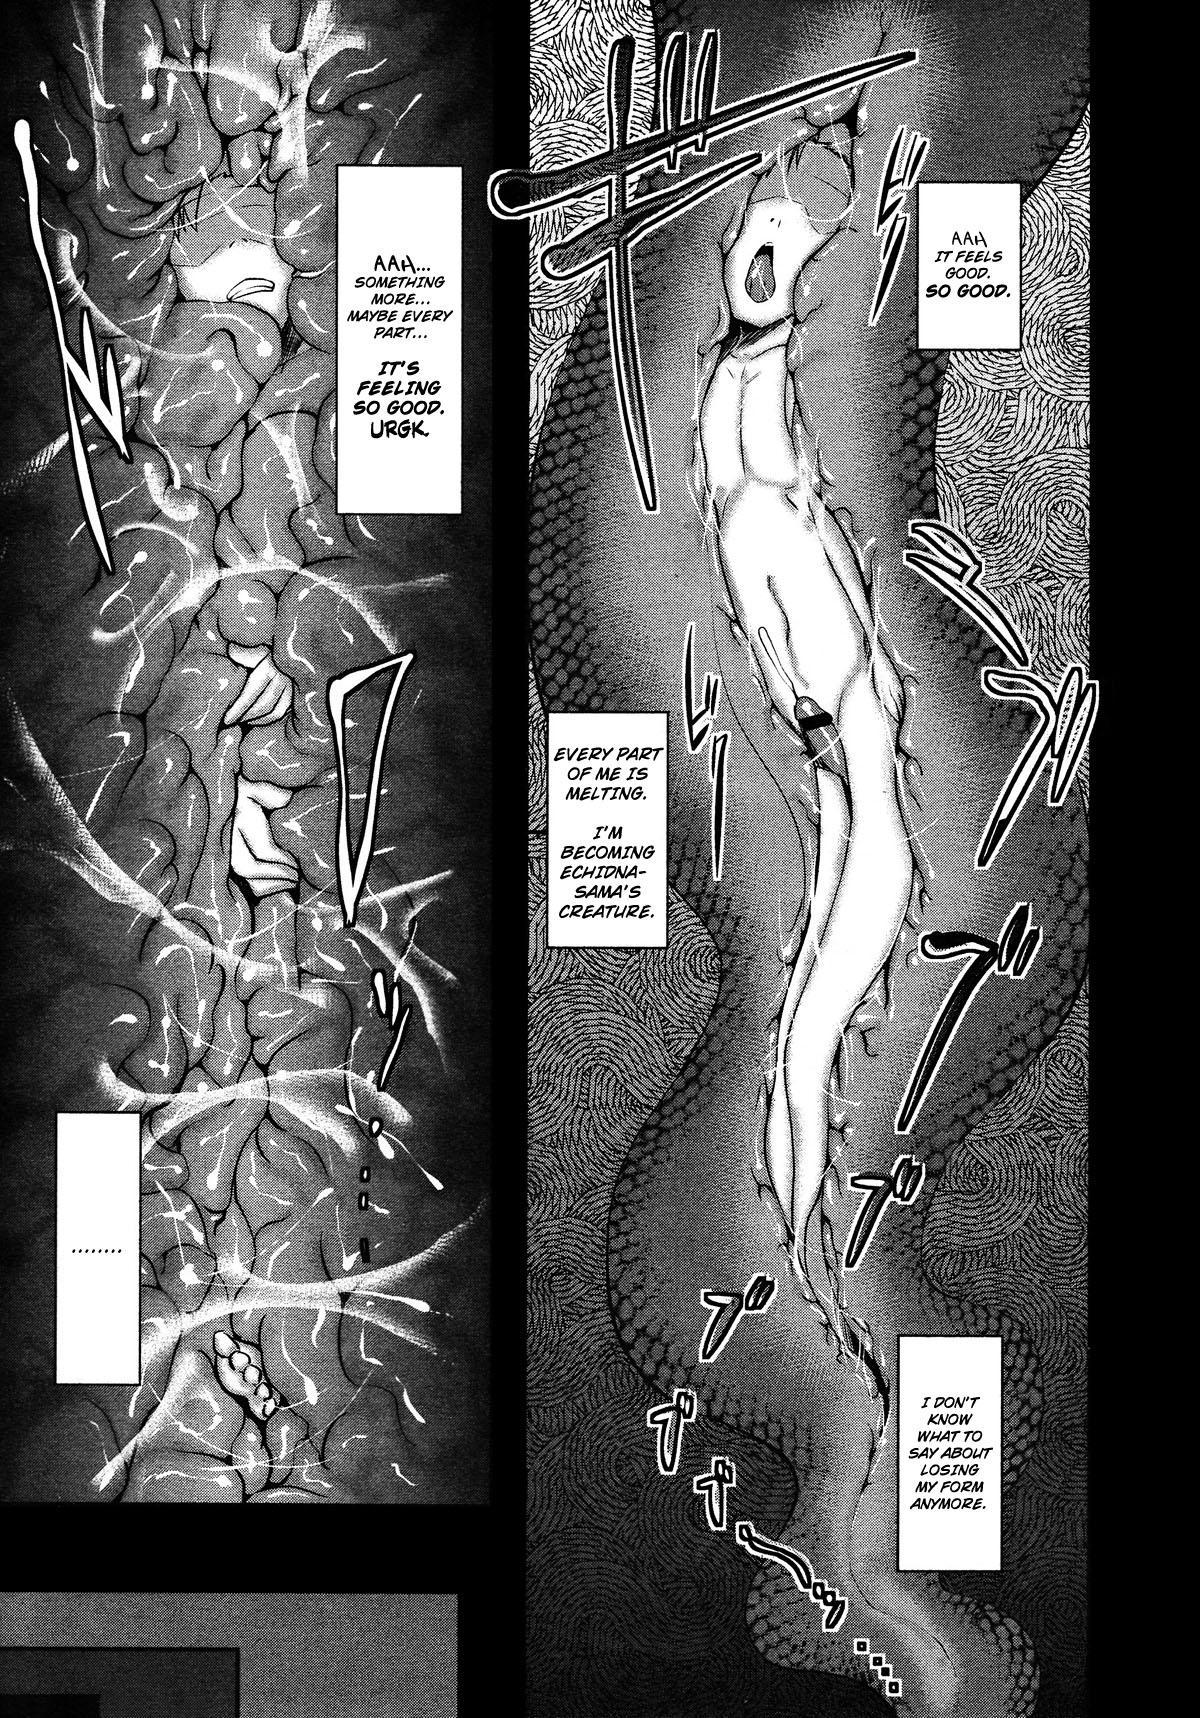 [AHOBAKA] Bokudakeno Mukougawa Ch. 0-1, 3-5, 7, 9 [English] [MintVoid + Vile + SaHa + thetsuuyaku] 64